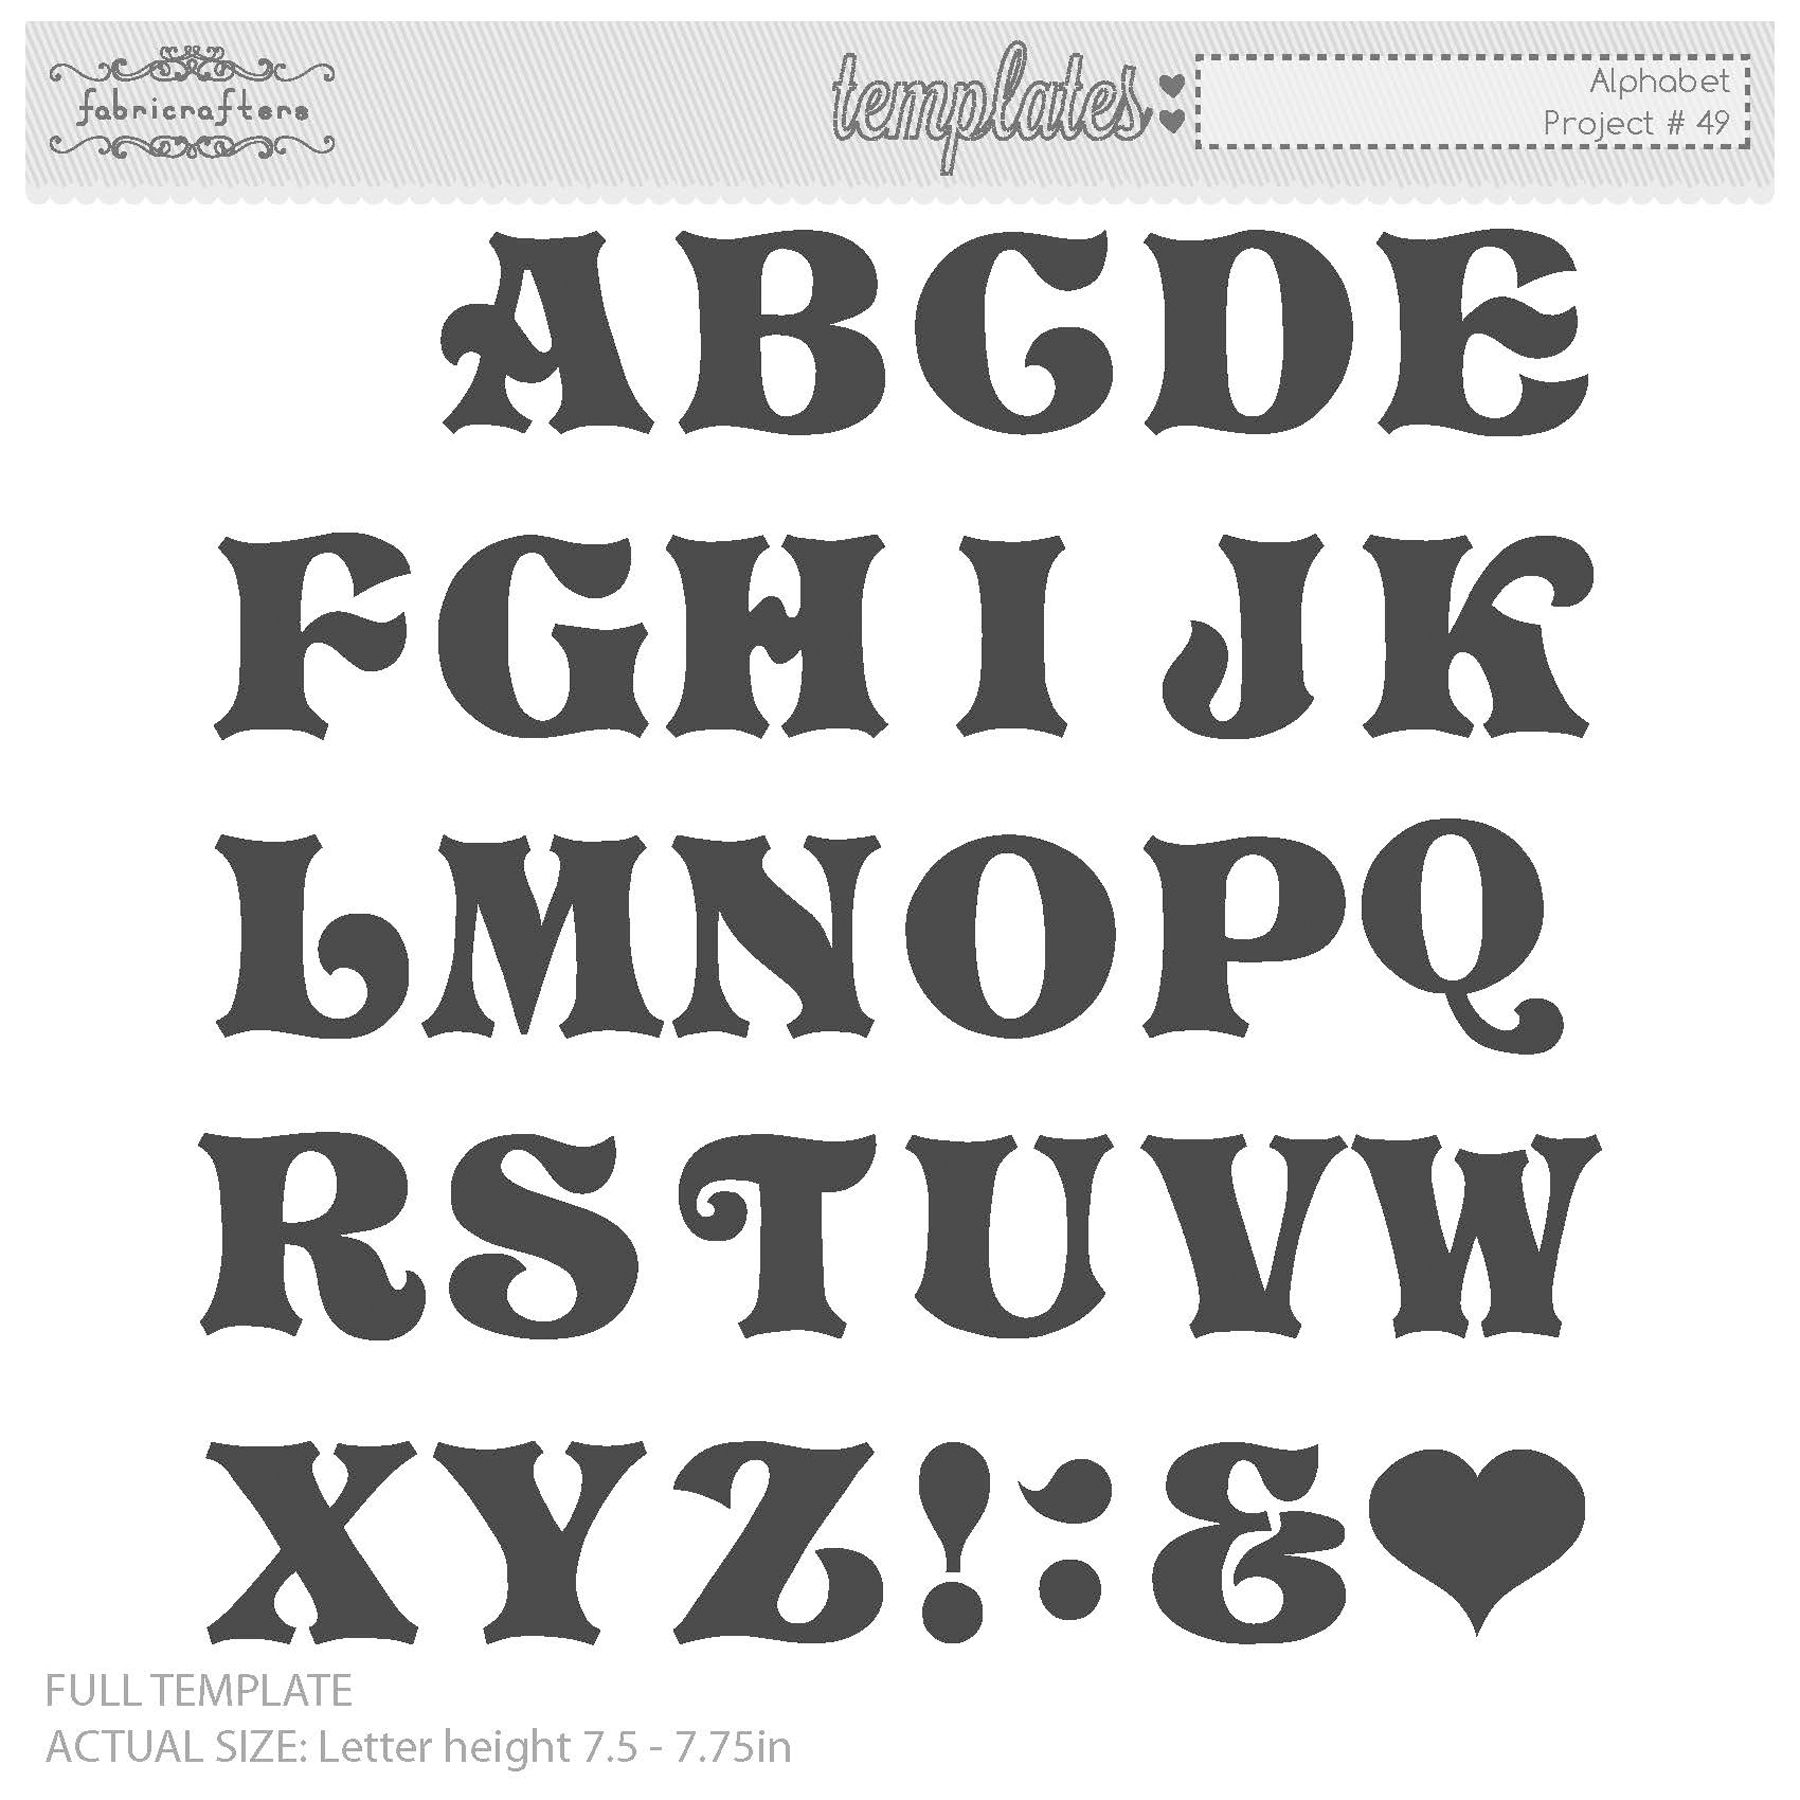 Printable Letter Stencils : Alphabet letter templates lettering fonts pinterest